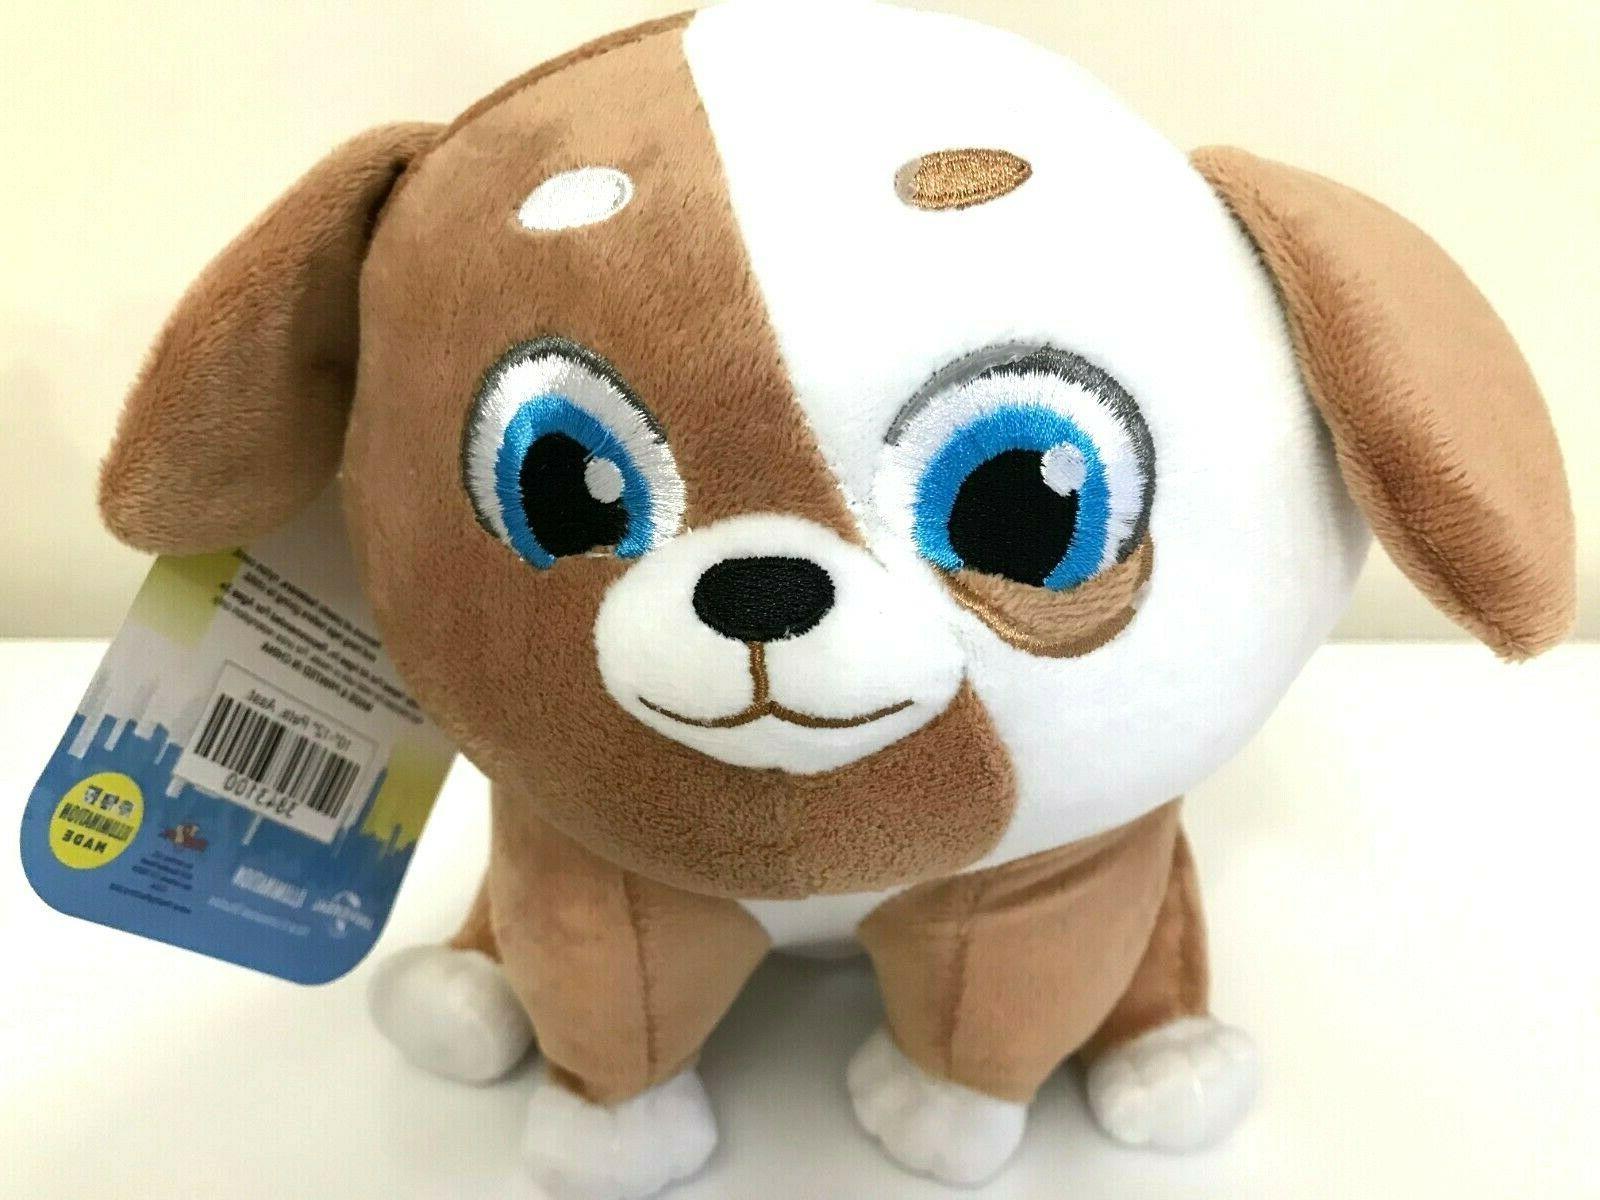 secret life of pets 2 plush toy